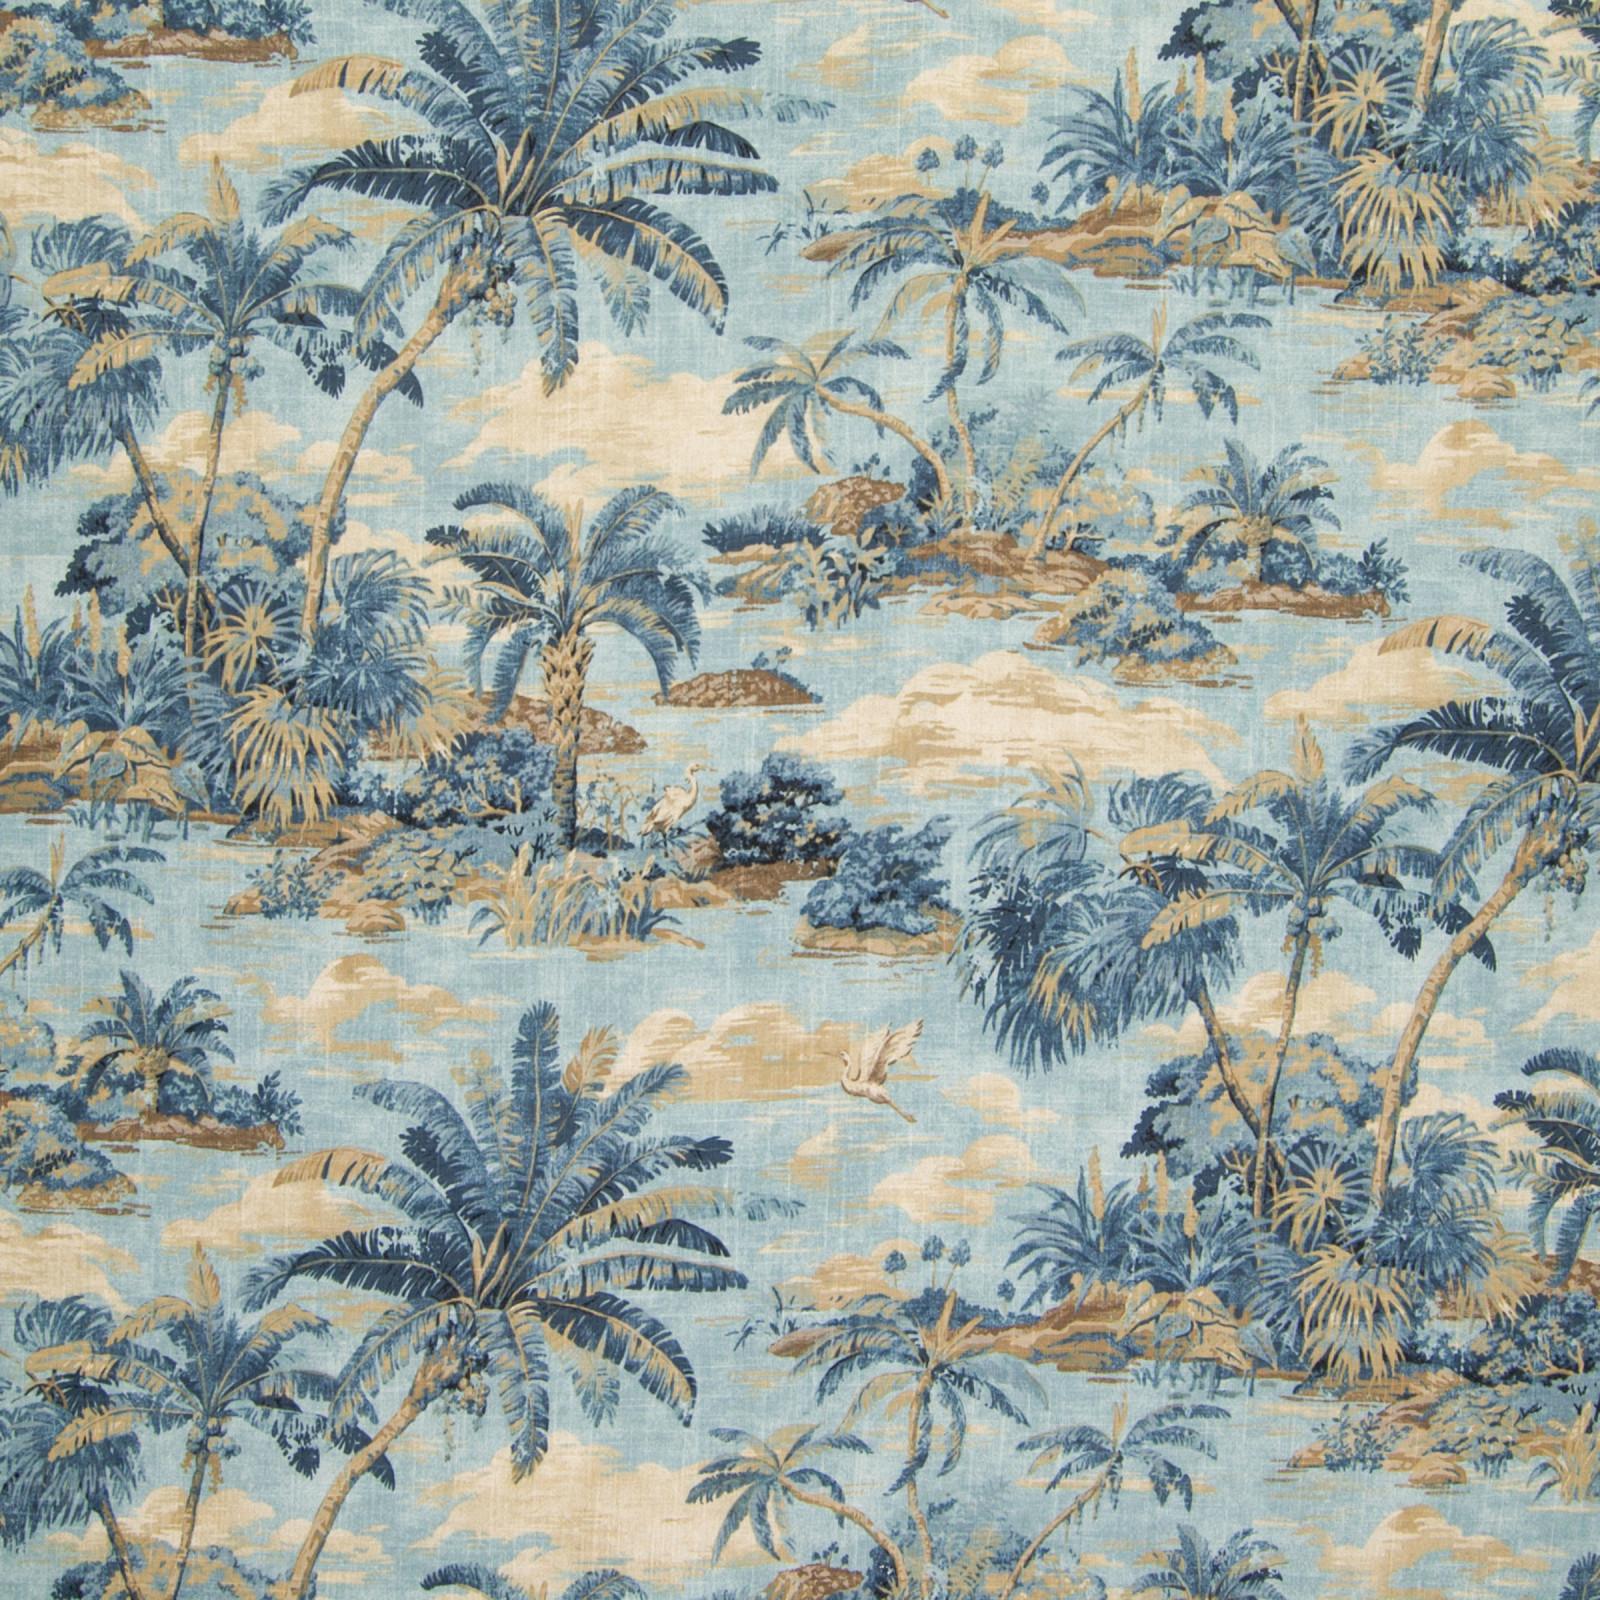 B6251 Riptide Greenhouse Fabrics